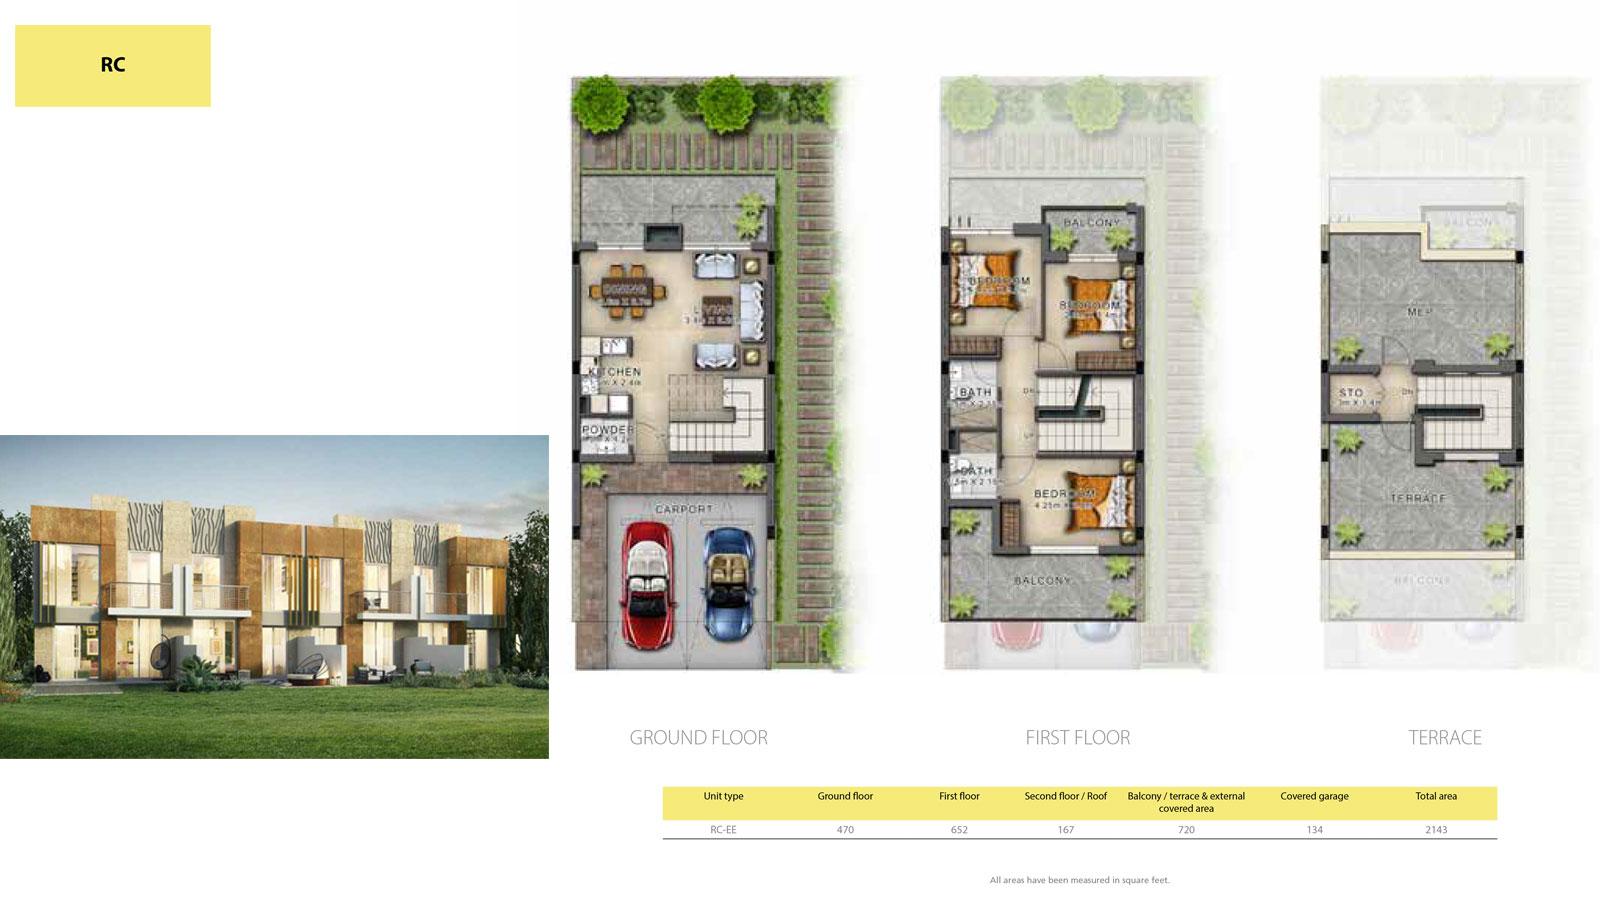 3 BR RC       (RC-EE, 3 Bedroom Villa, Size 2143 sq ft)